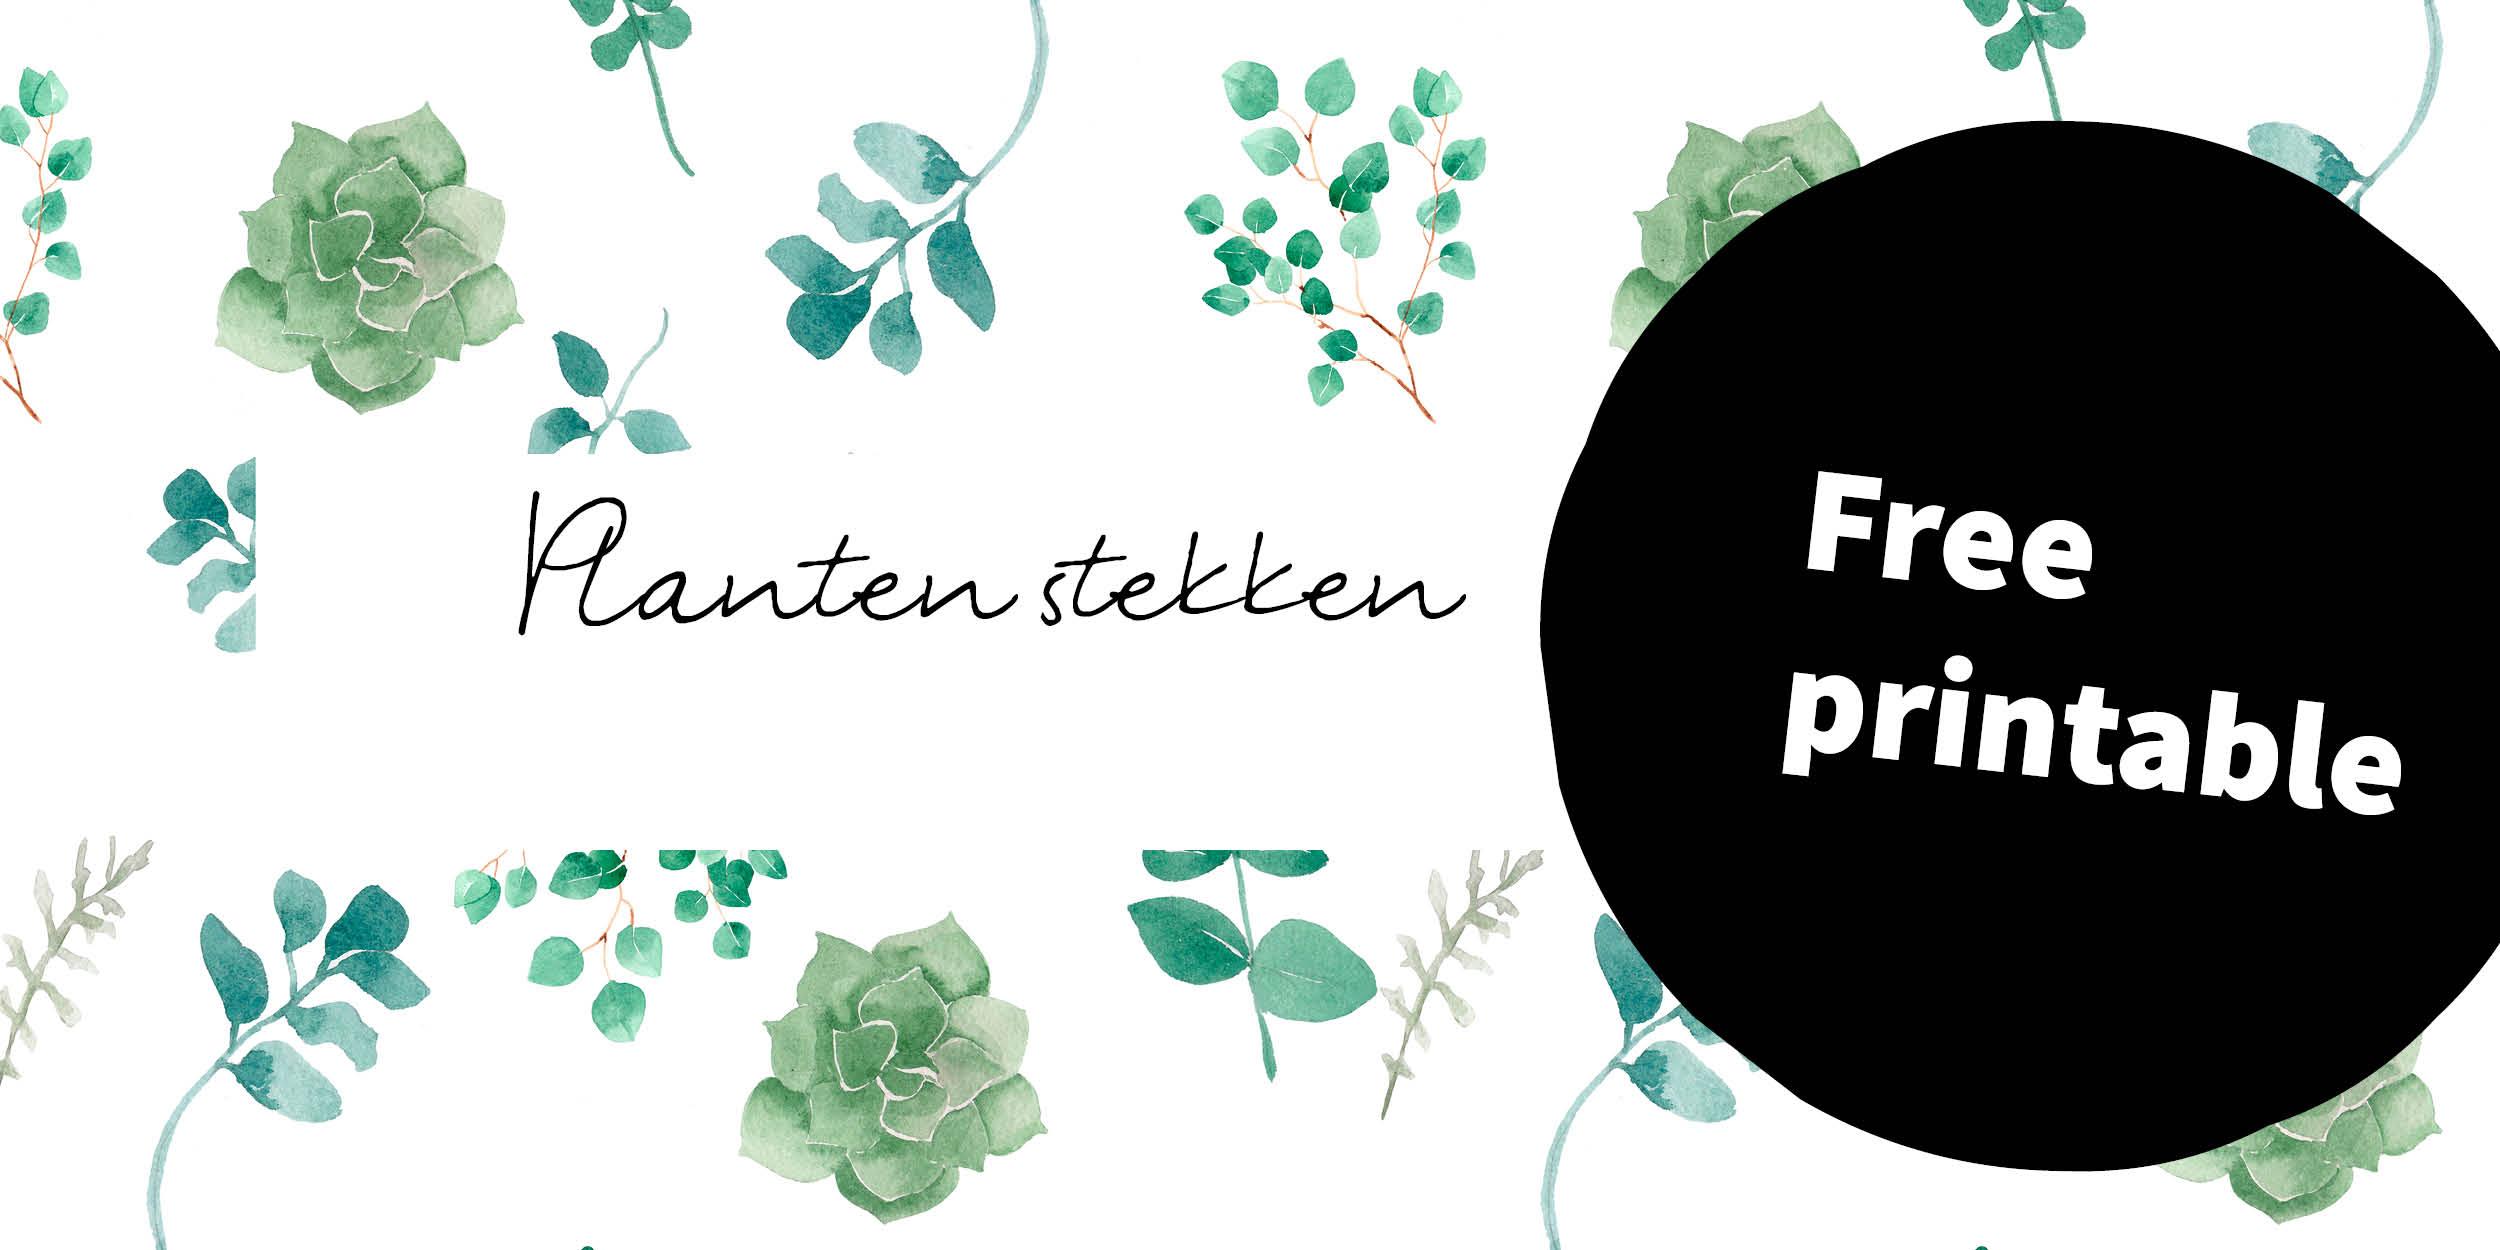 banner free printable plantjes stekken